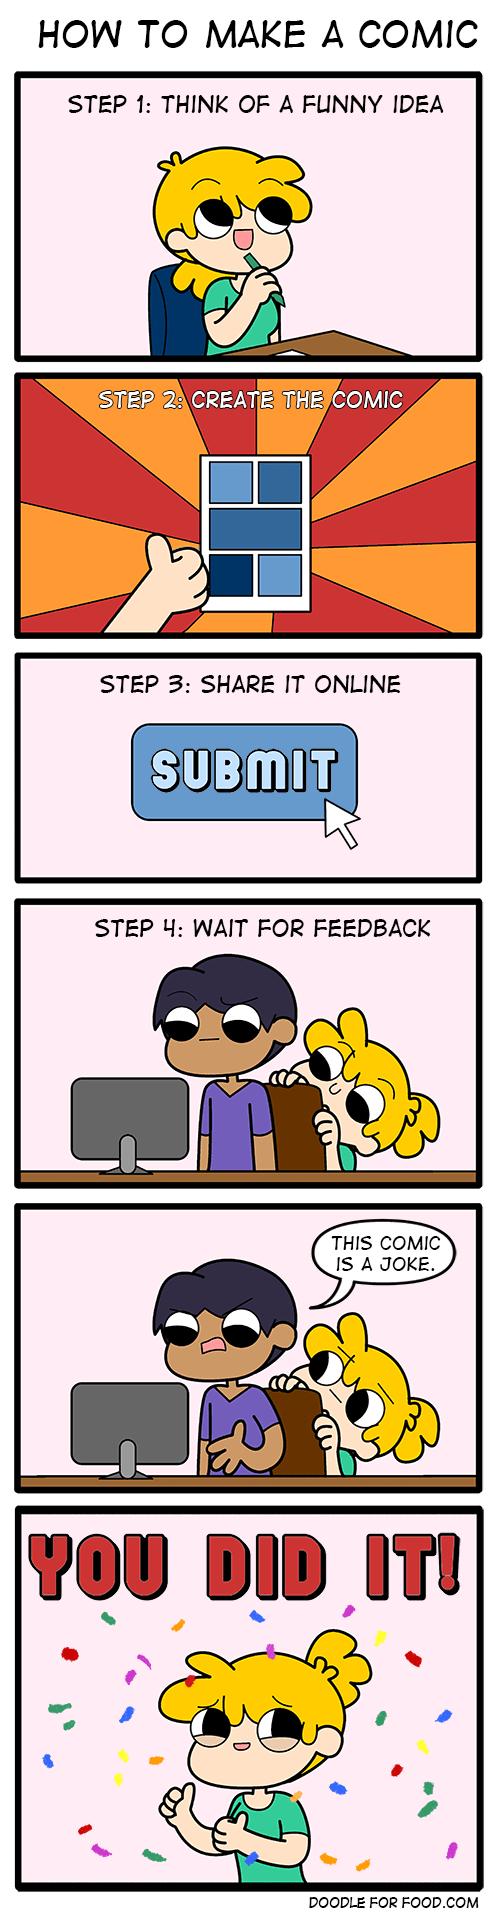 funny-web-comics-how-to-make-a-web-comic